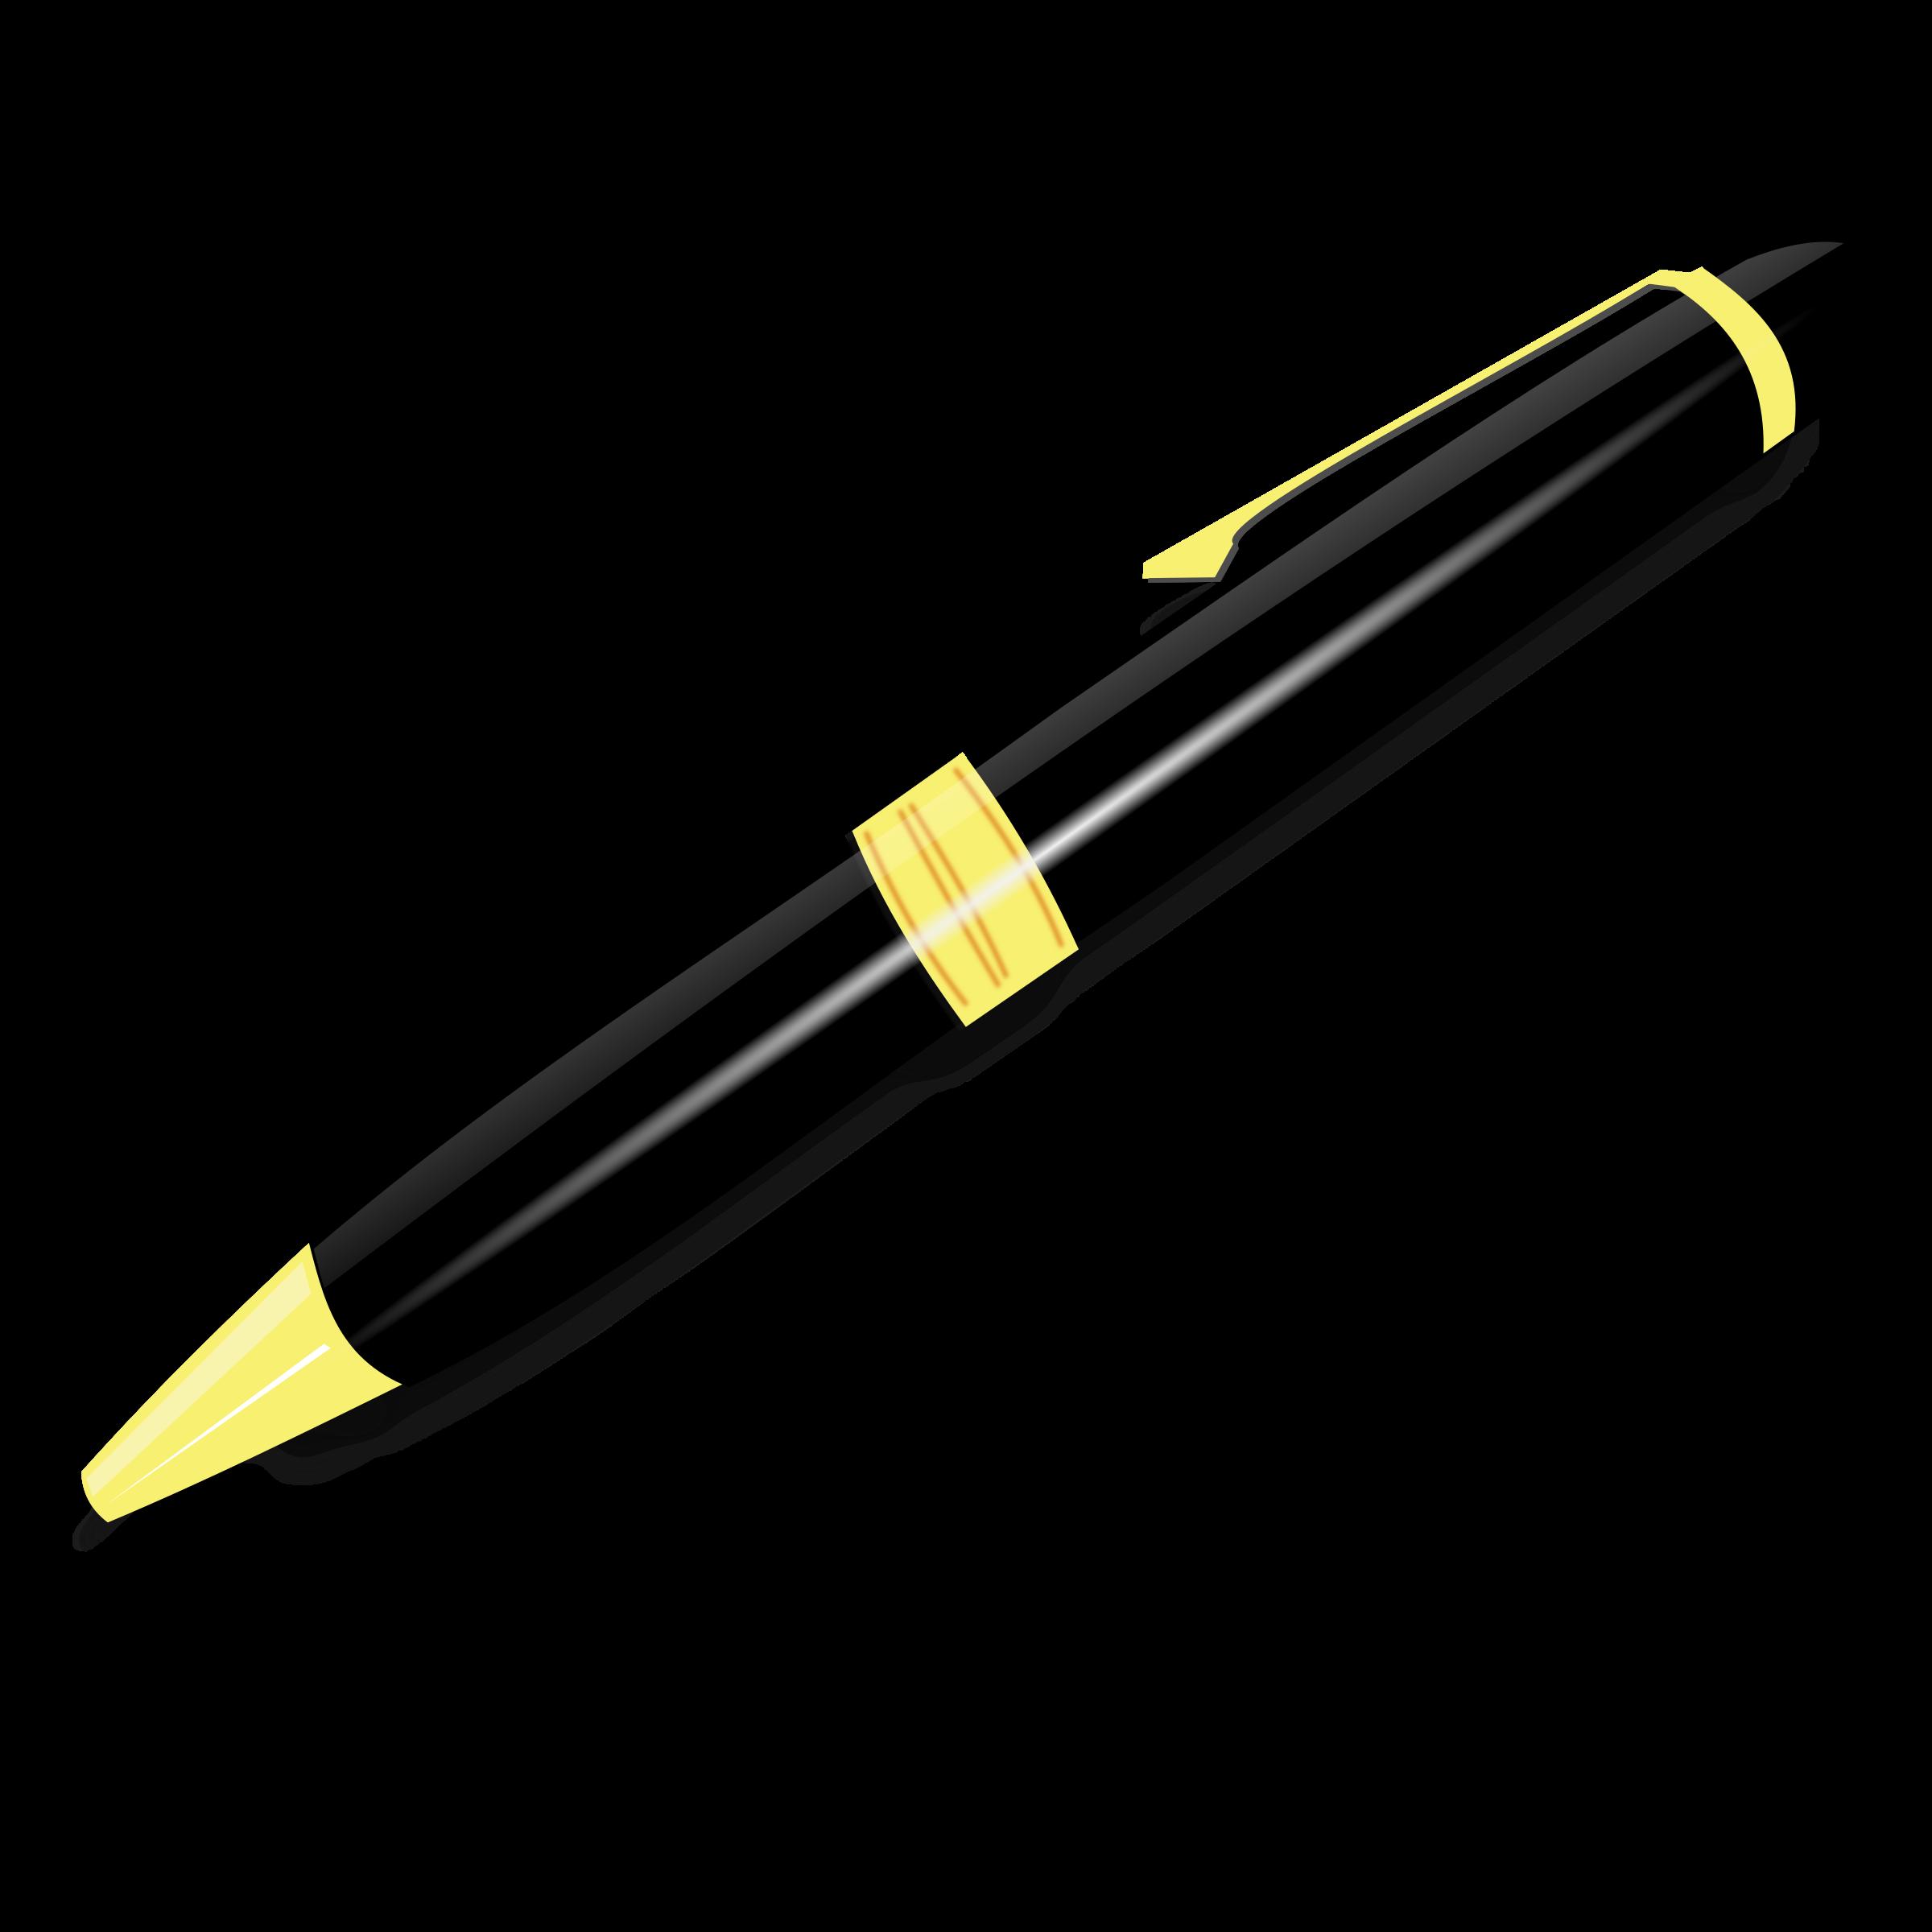 Pen clipart anything Clipart pen pen